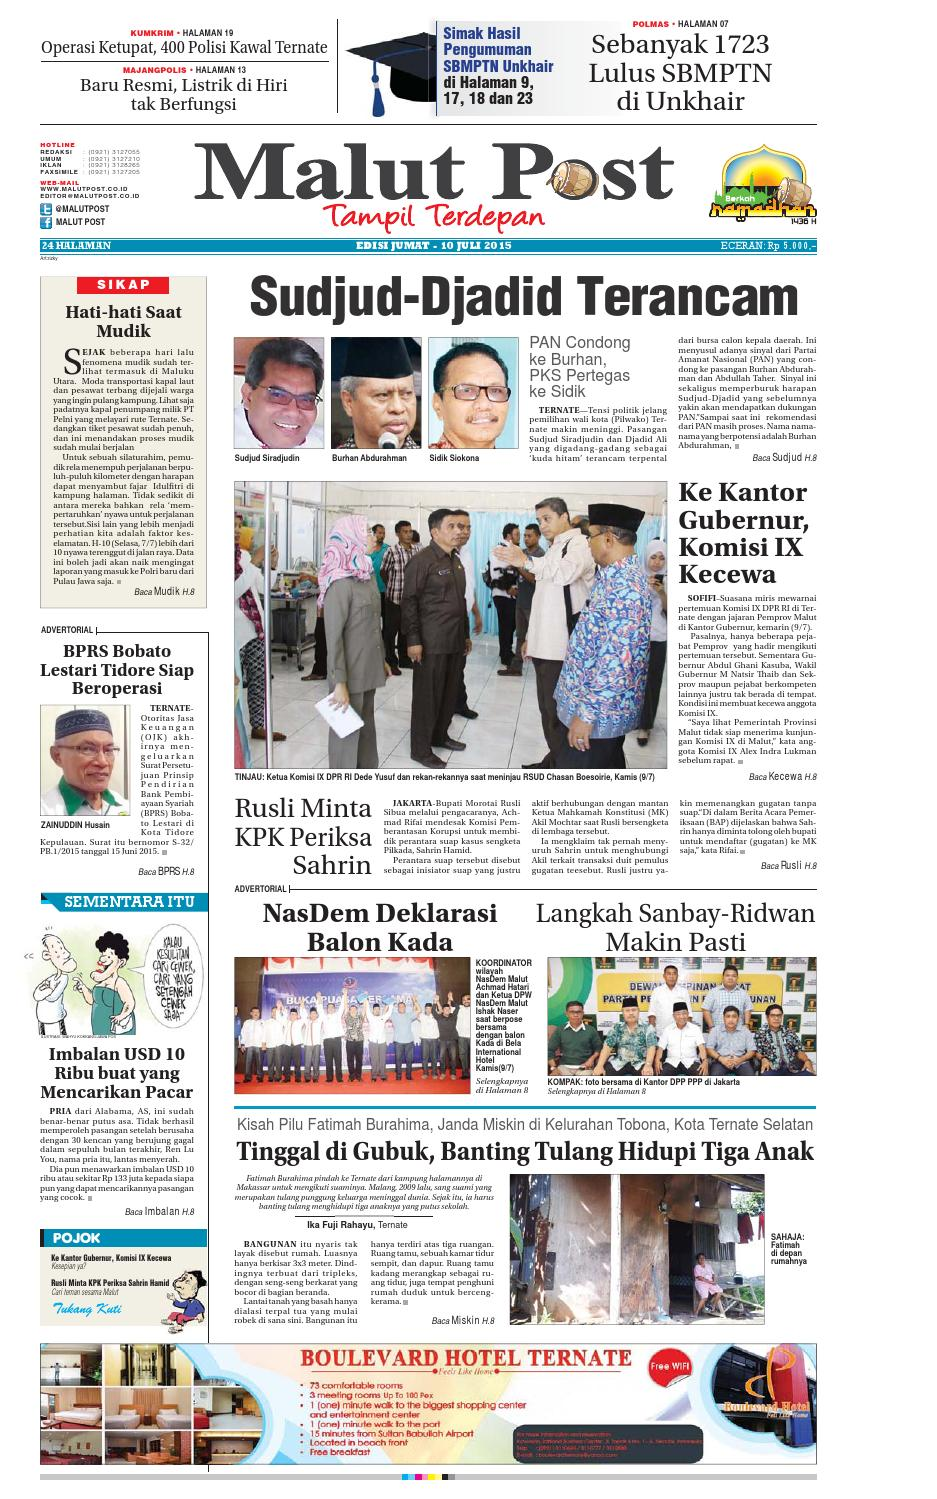 Media Indonesia By Asmat Issuu Produk Ukm Bumn Teh Hijau Celup Cap Botol 25 Tea Bags Aroma Melati Jumashop Free Ongkir Depok Ampamp Jakarta